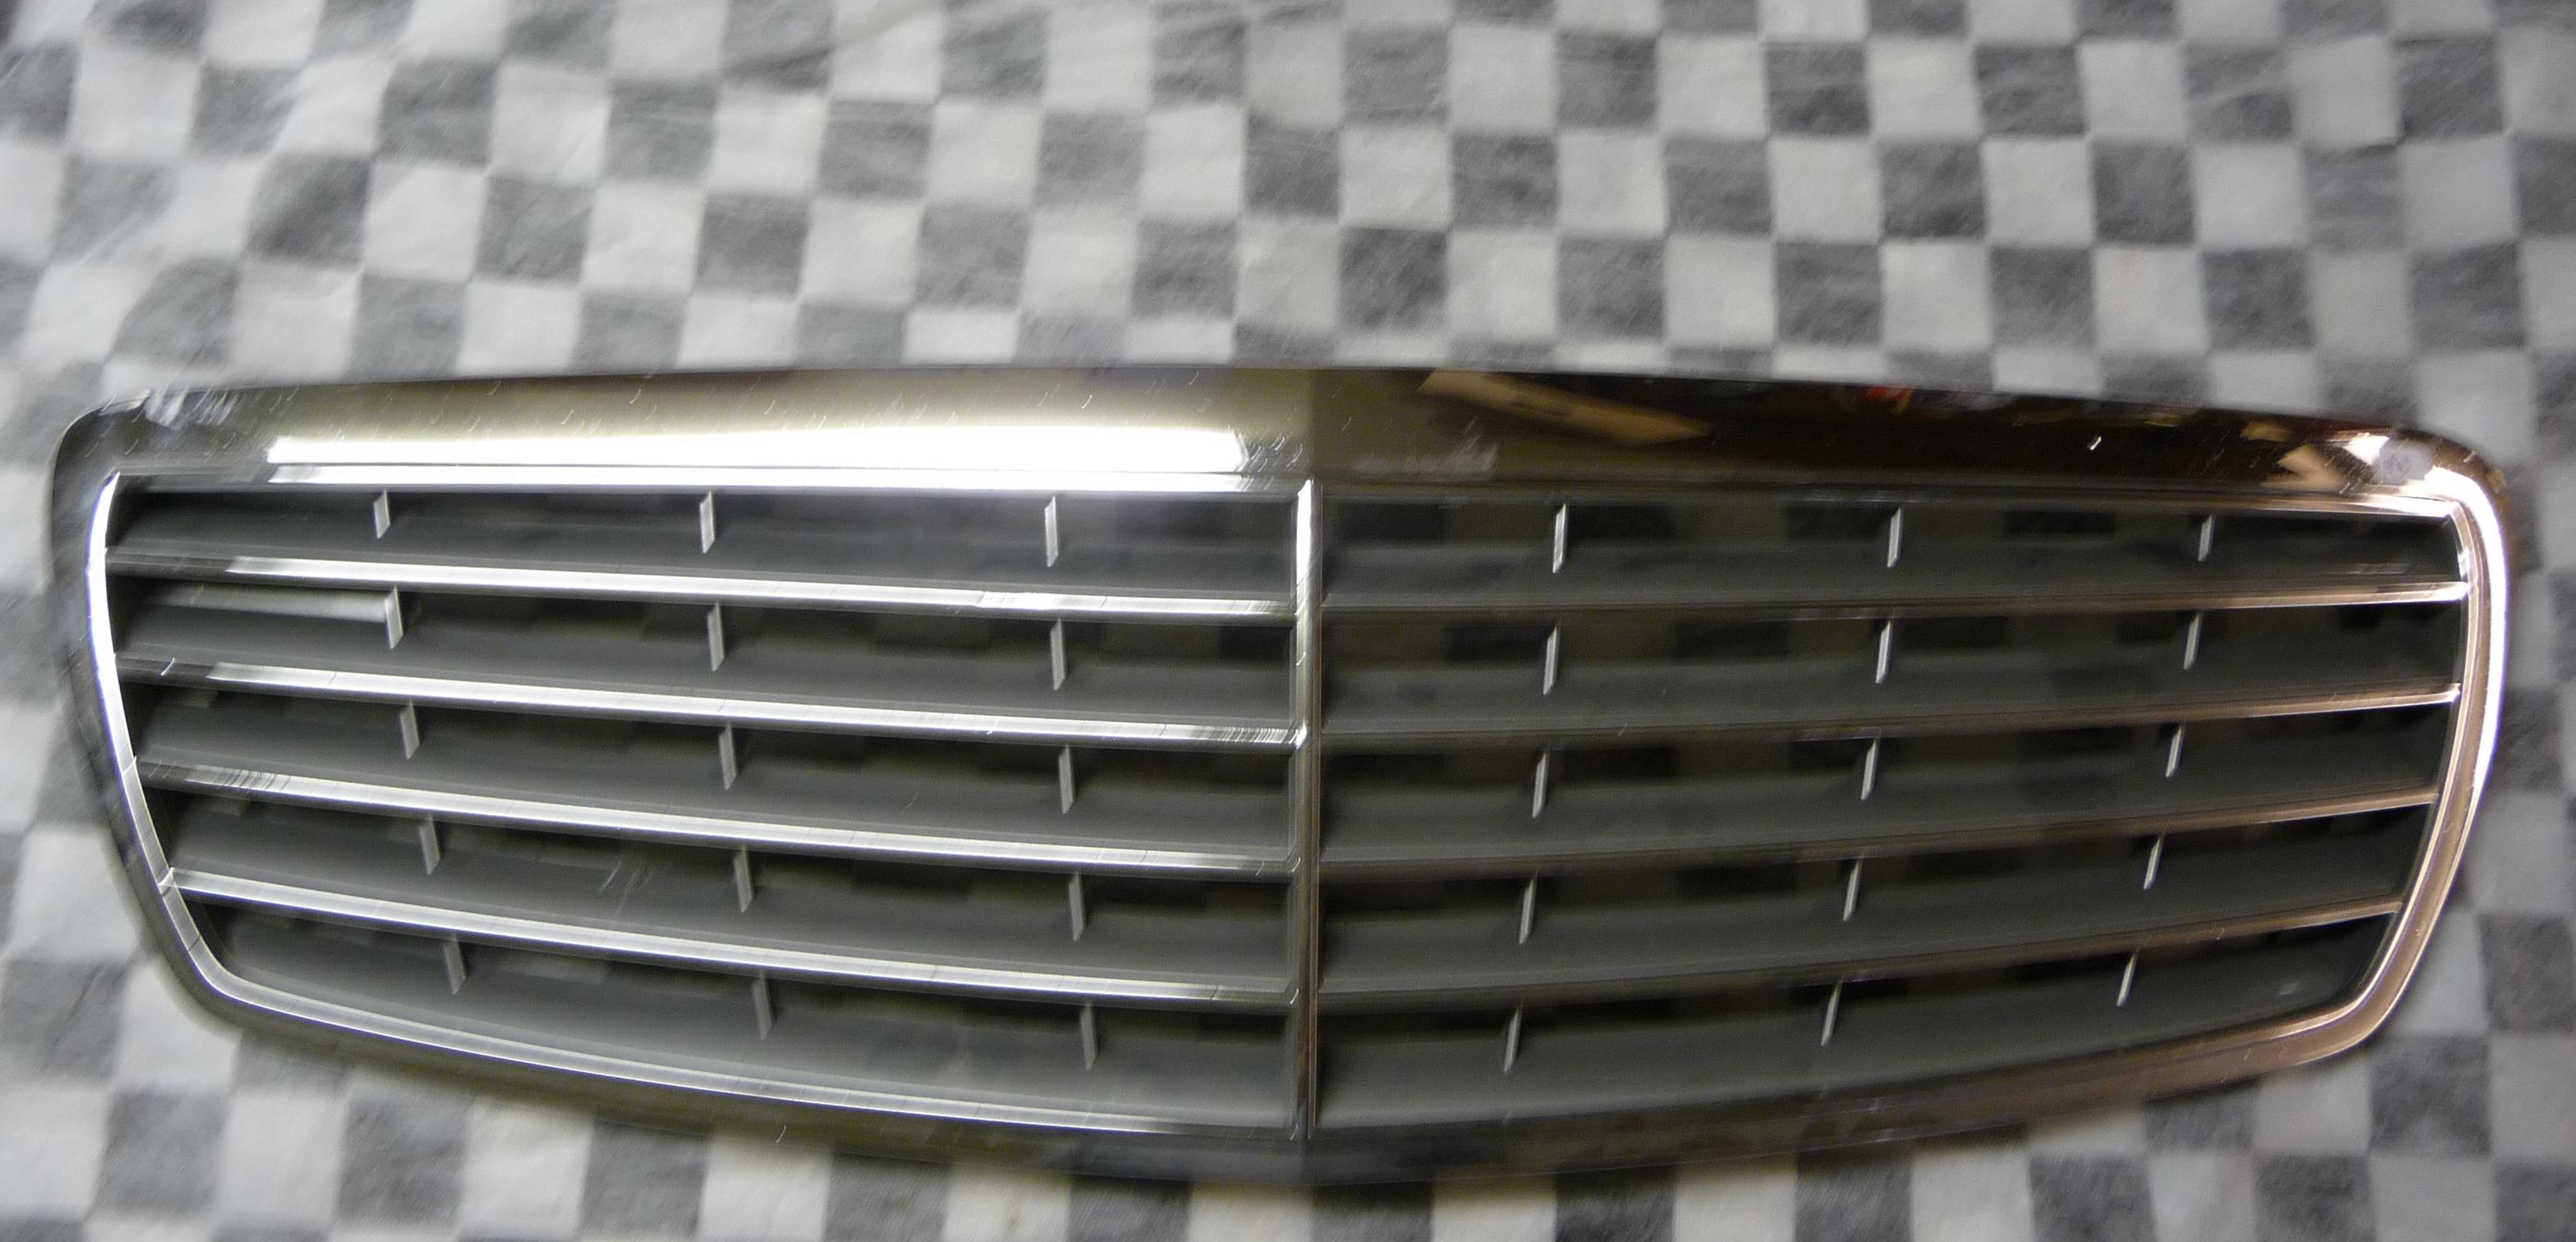 Mercedes Benz E Class E320 E350 W211 Front Radiator Grille Grill 2118800383 OEM